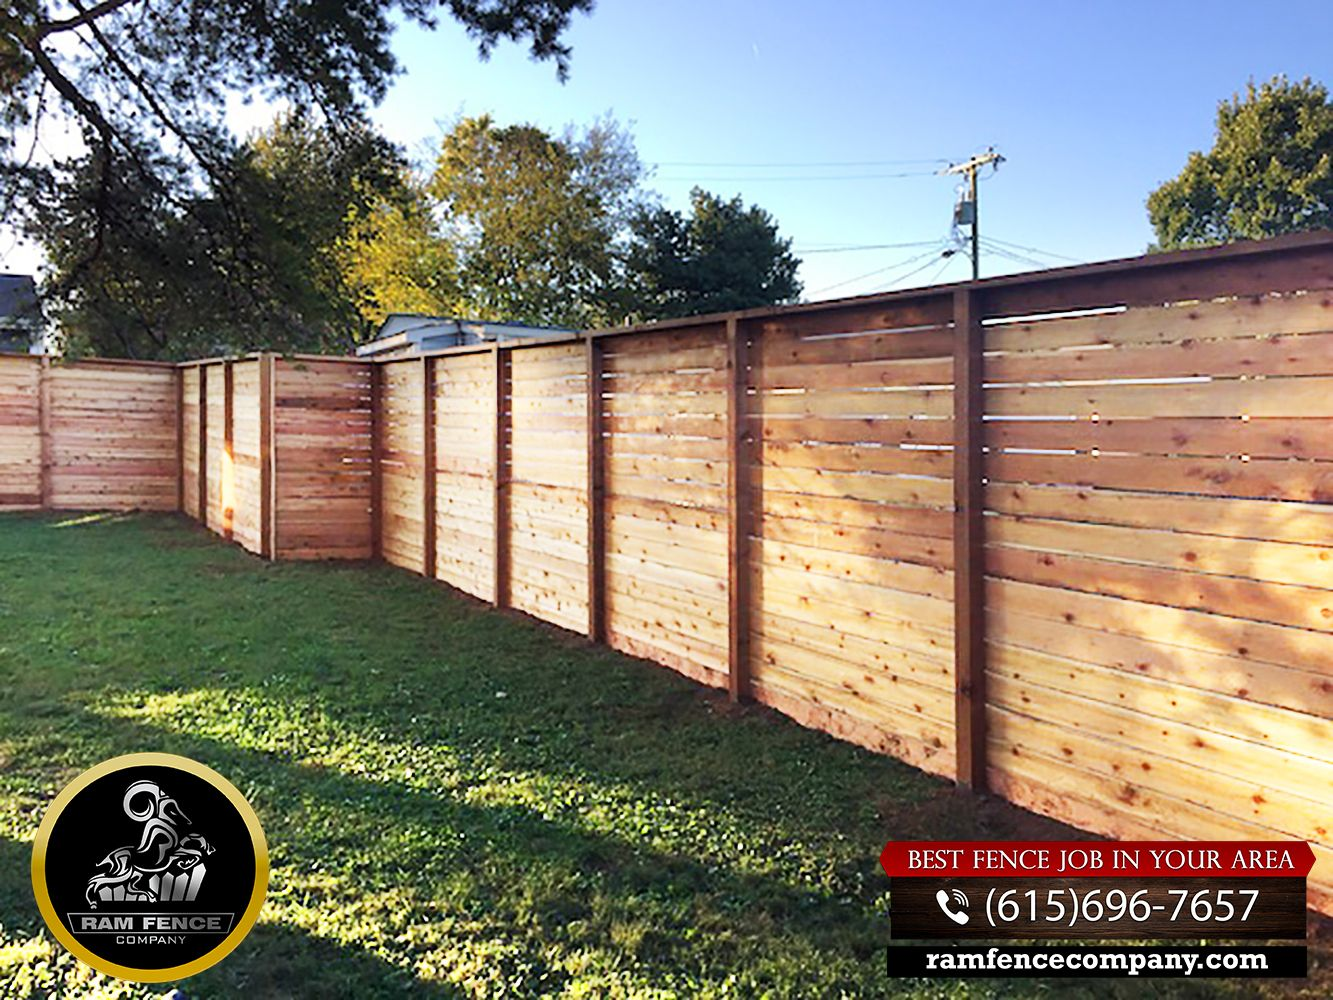 We Make Profesional Installations Of Wood Fencing Vinily Fencing Aluminium Fencing Farm Fencig Gates Railings De Deck With Pergola Wood Fence Aluminum Fence